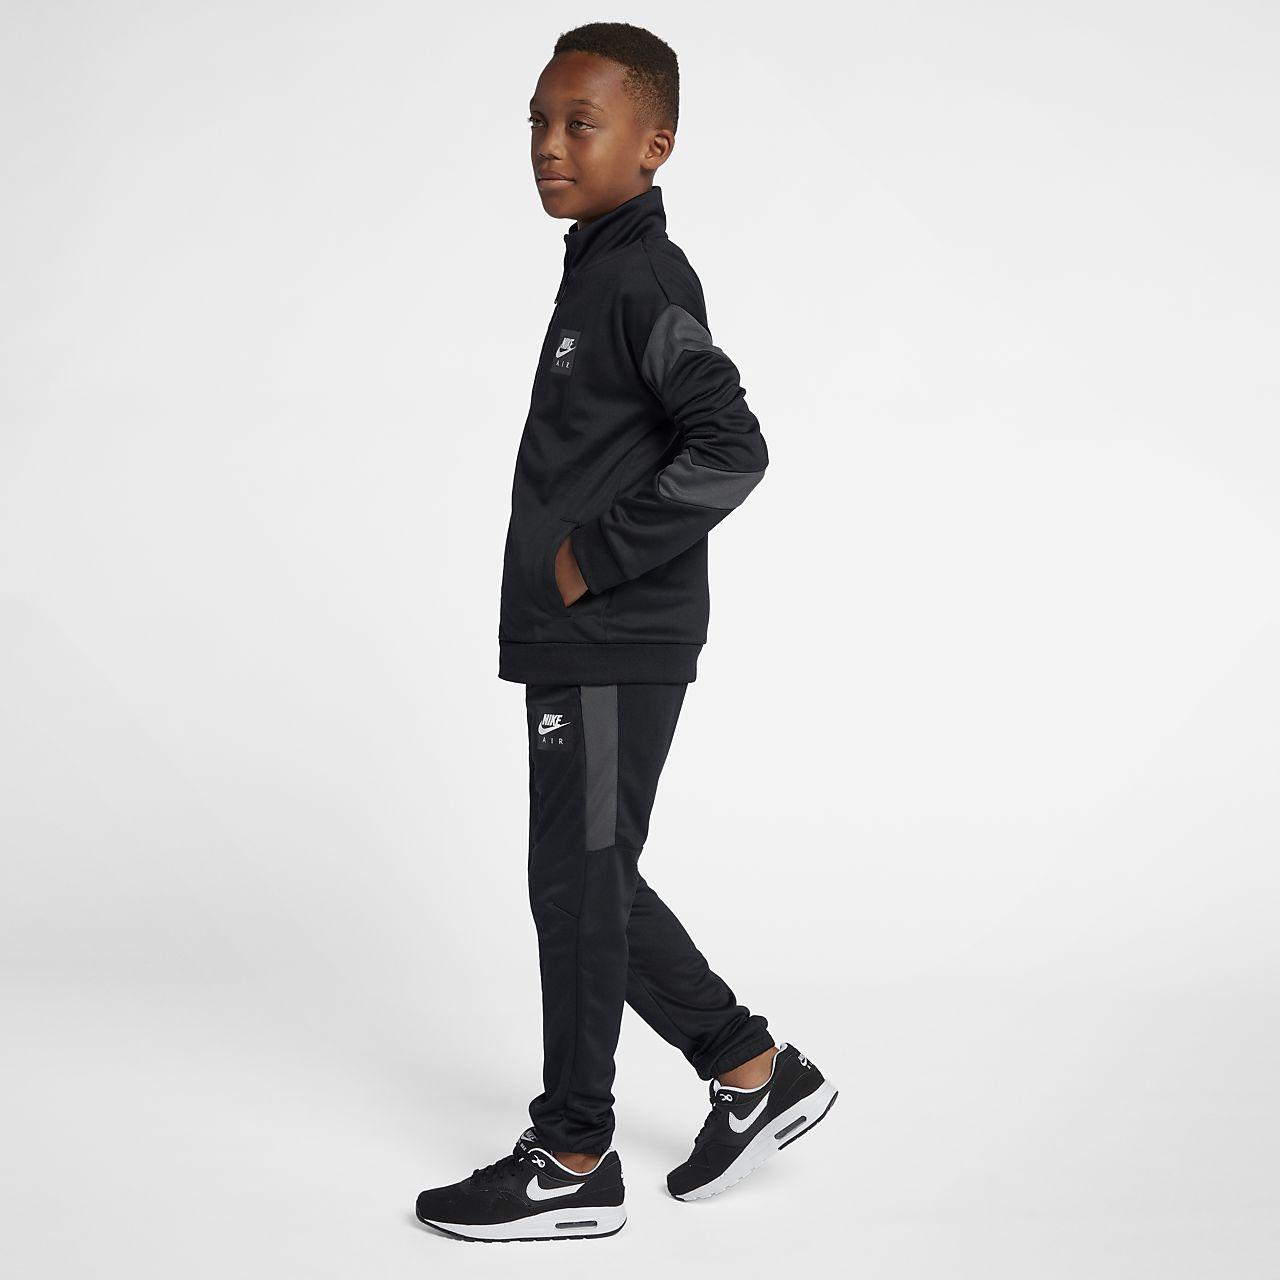 9f0e9d0a05cf Nike Air Older Kids  (Boys ) Tracksuit. Nike.com GB